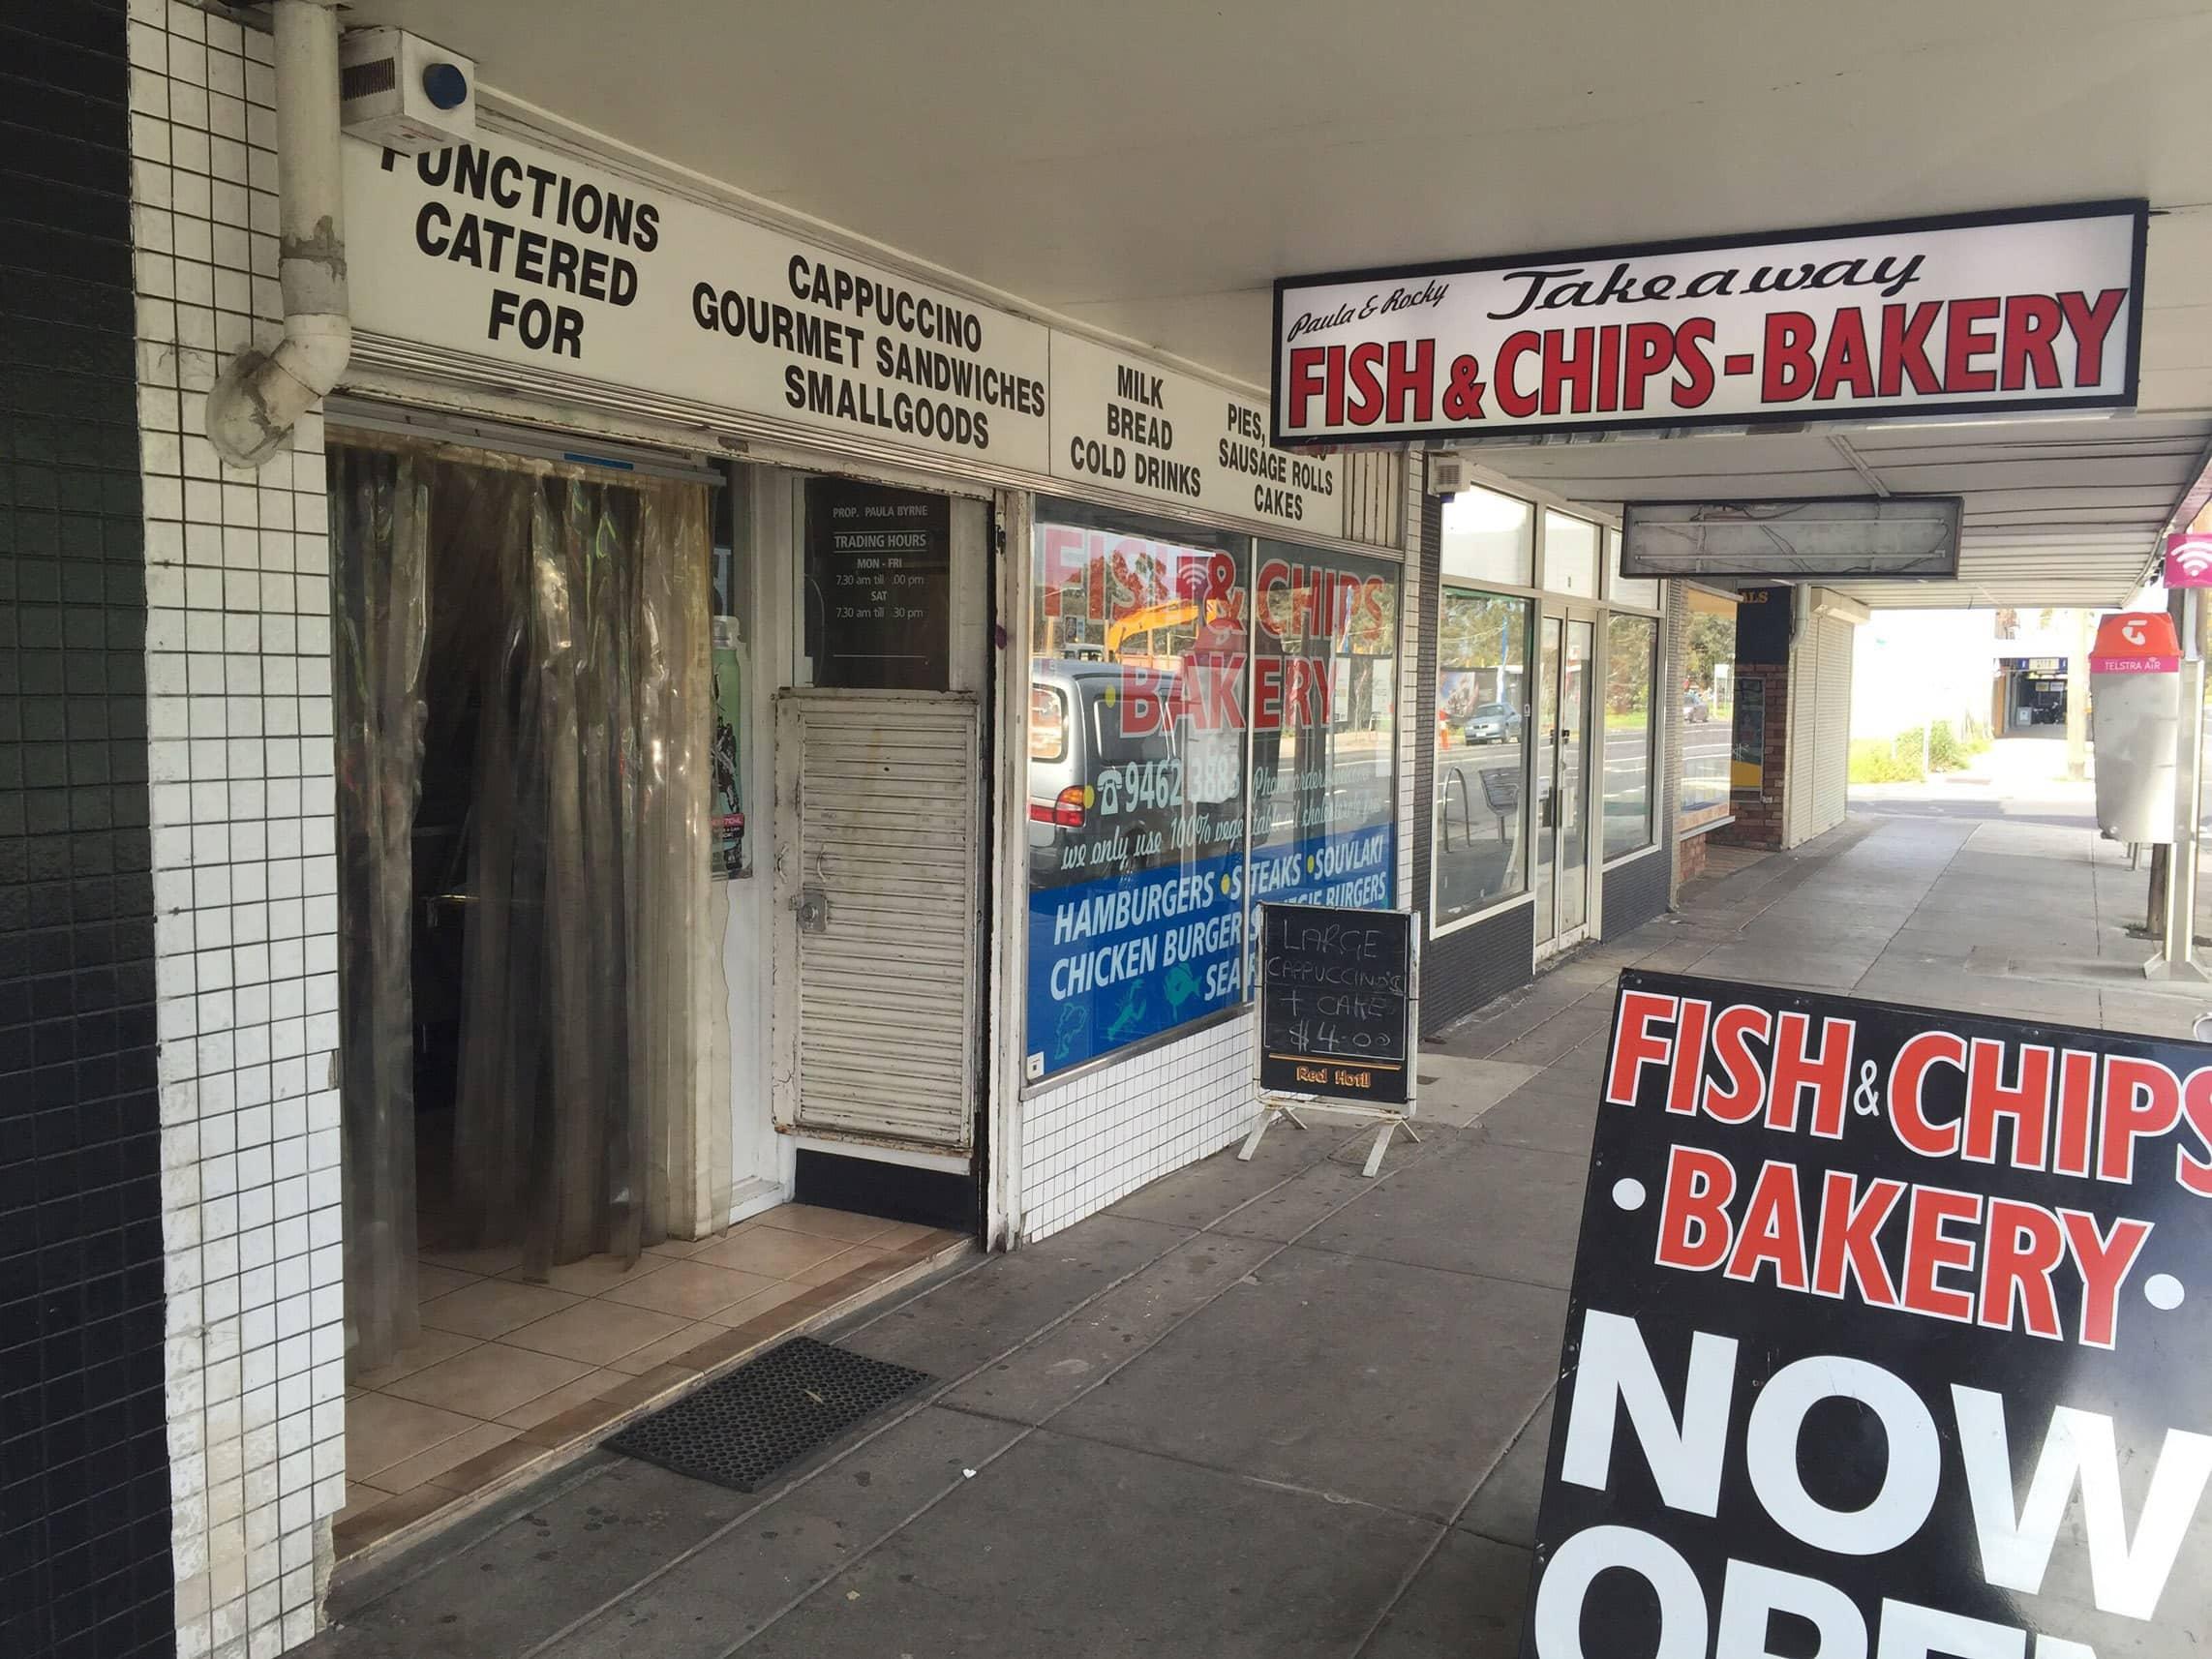 Paula & Rocky Fish & Chips - Bakery | 39 Johnson Street, Reservoir, Melbourne, VIC, Reservoir, Victoria 3073 | +61 3 9462 3883